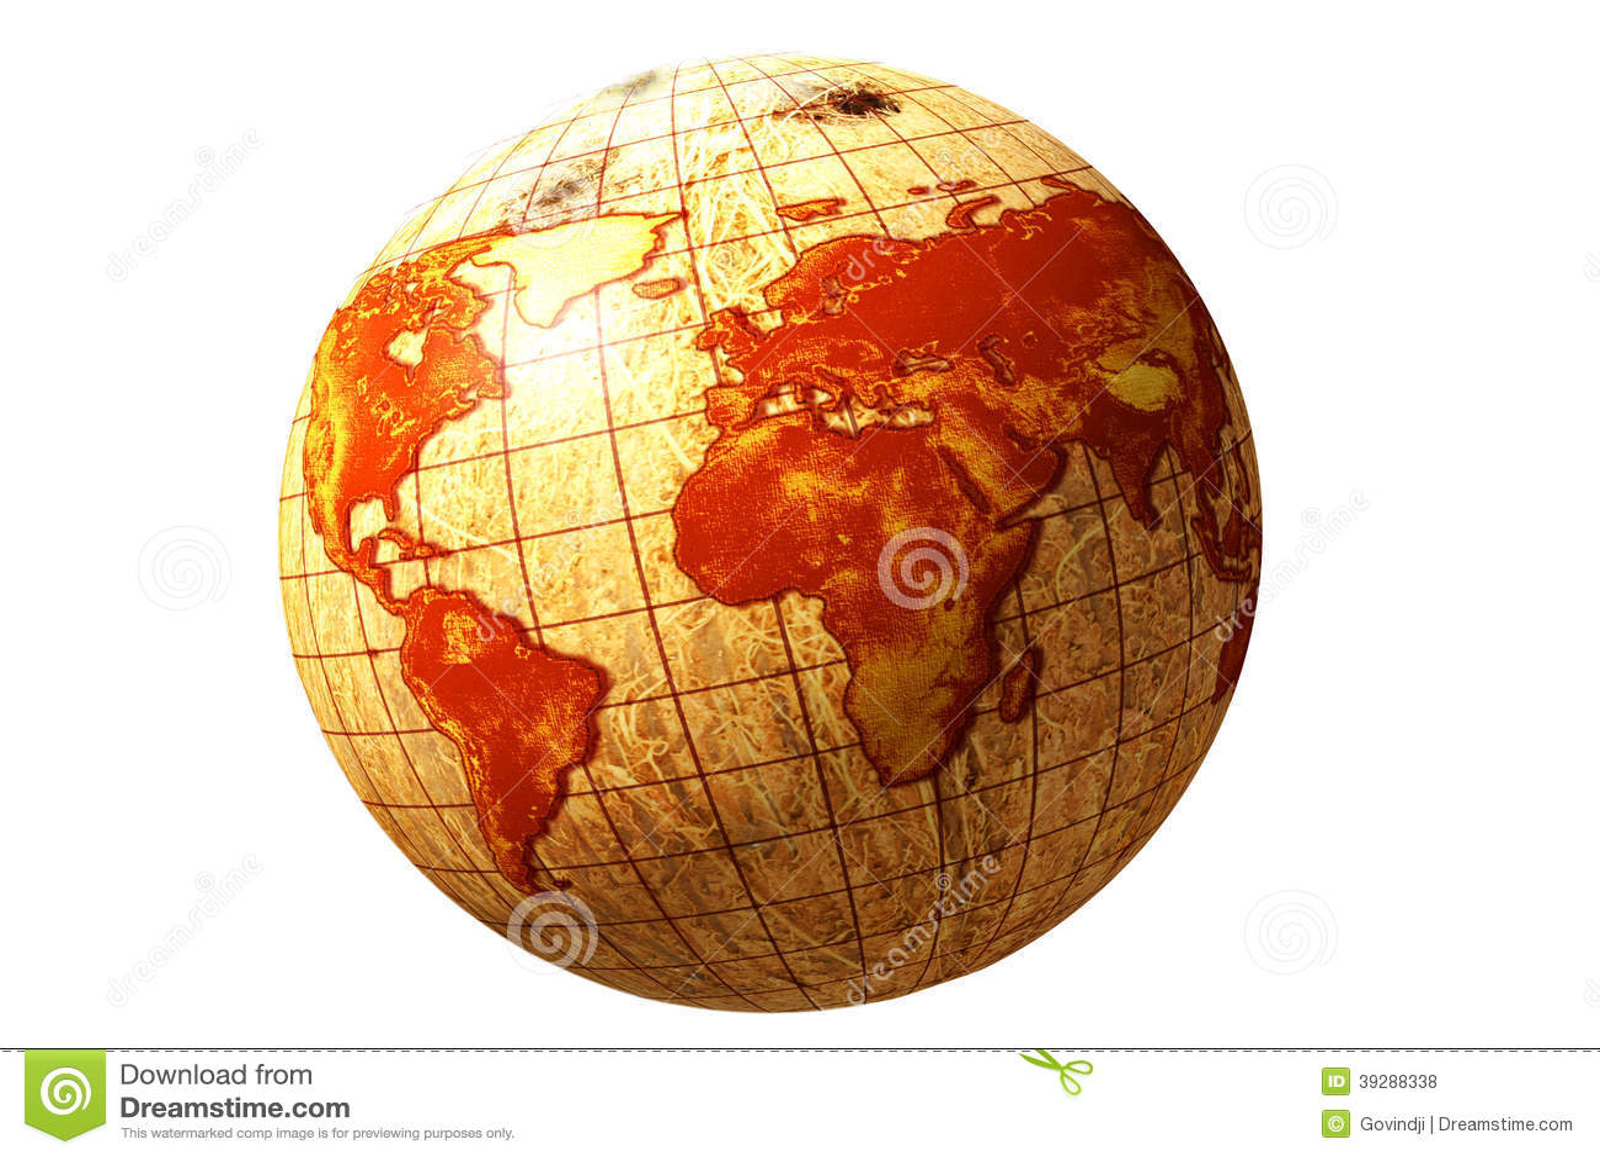 World globe map on coconut